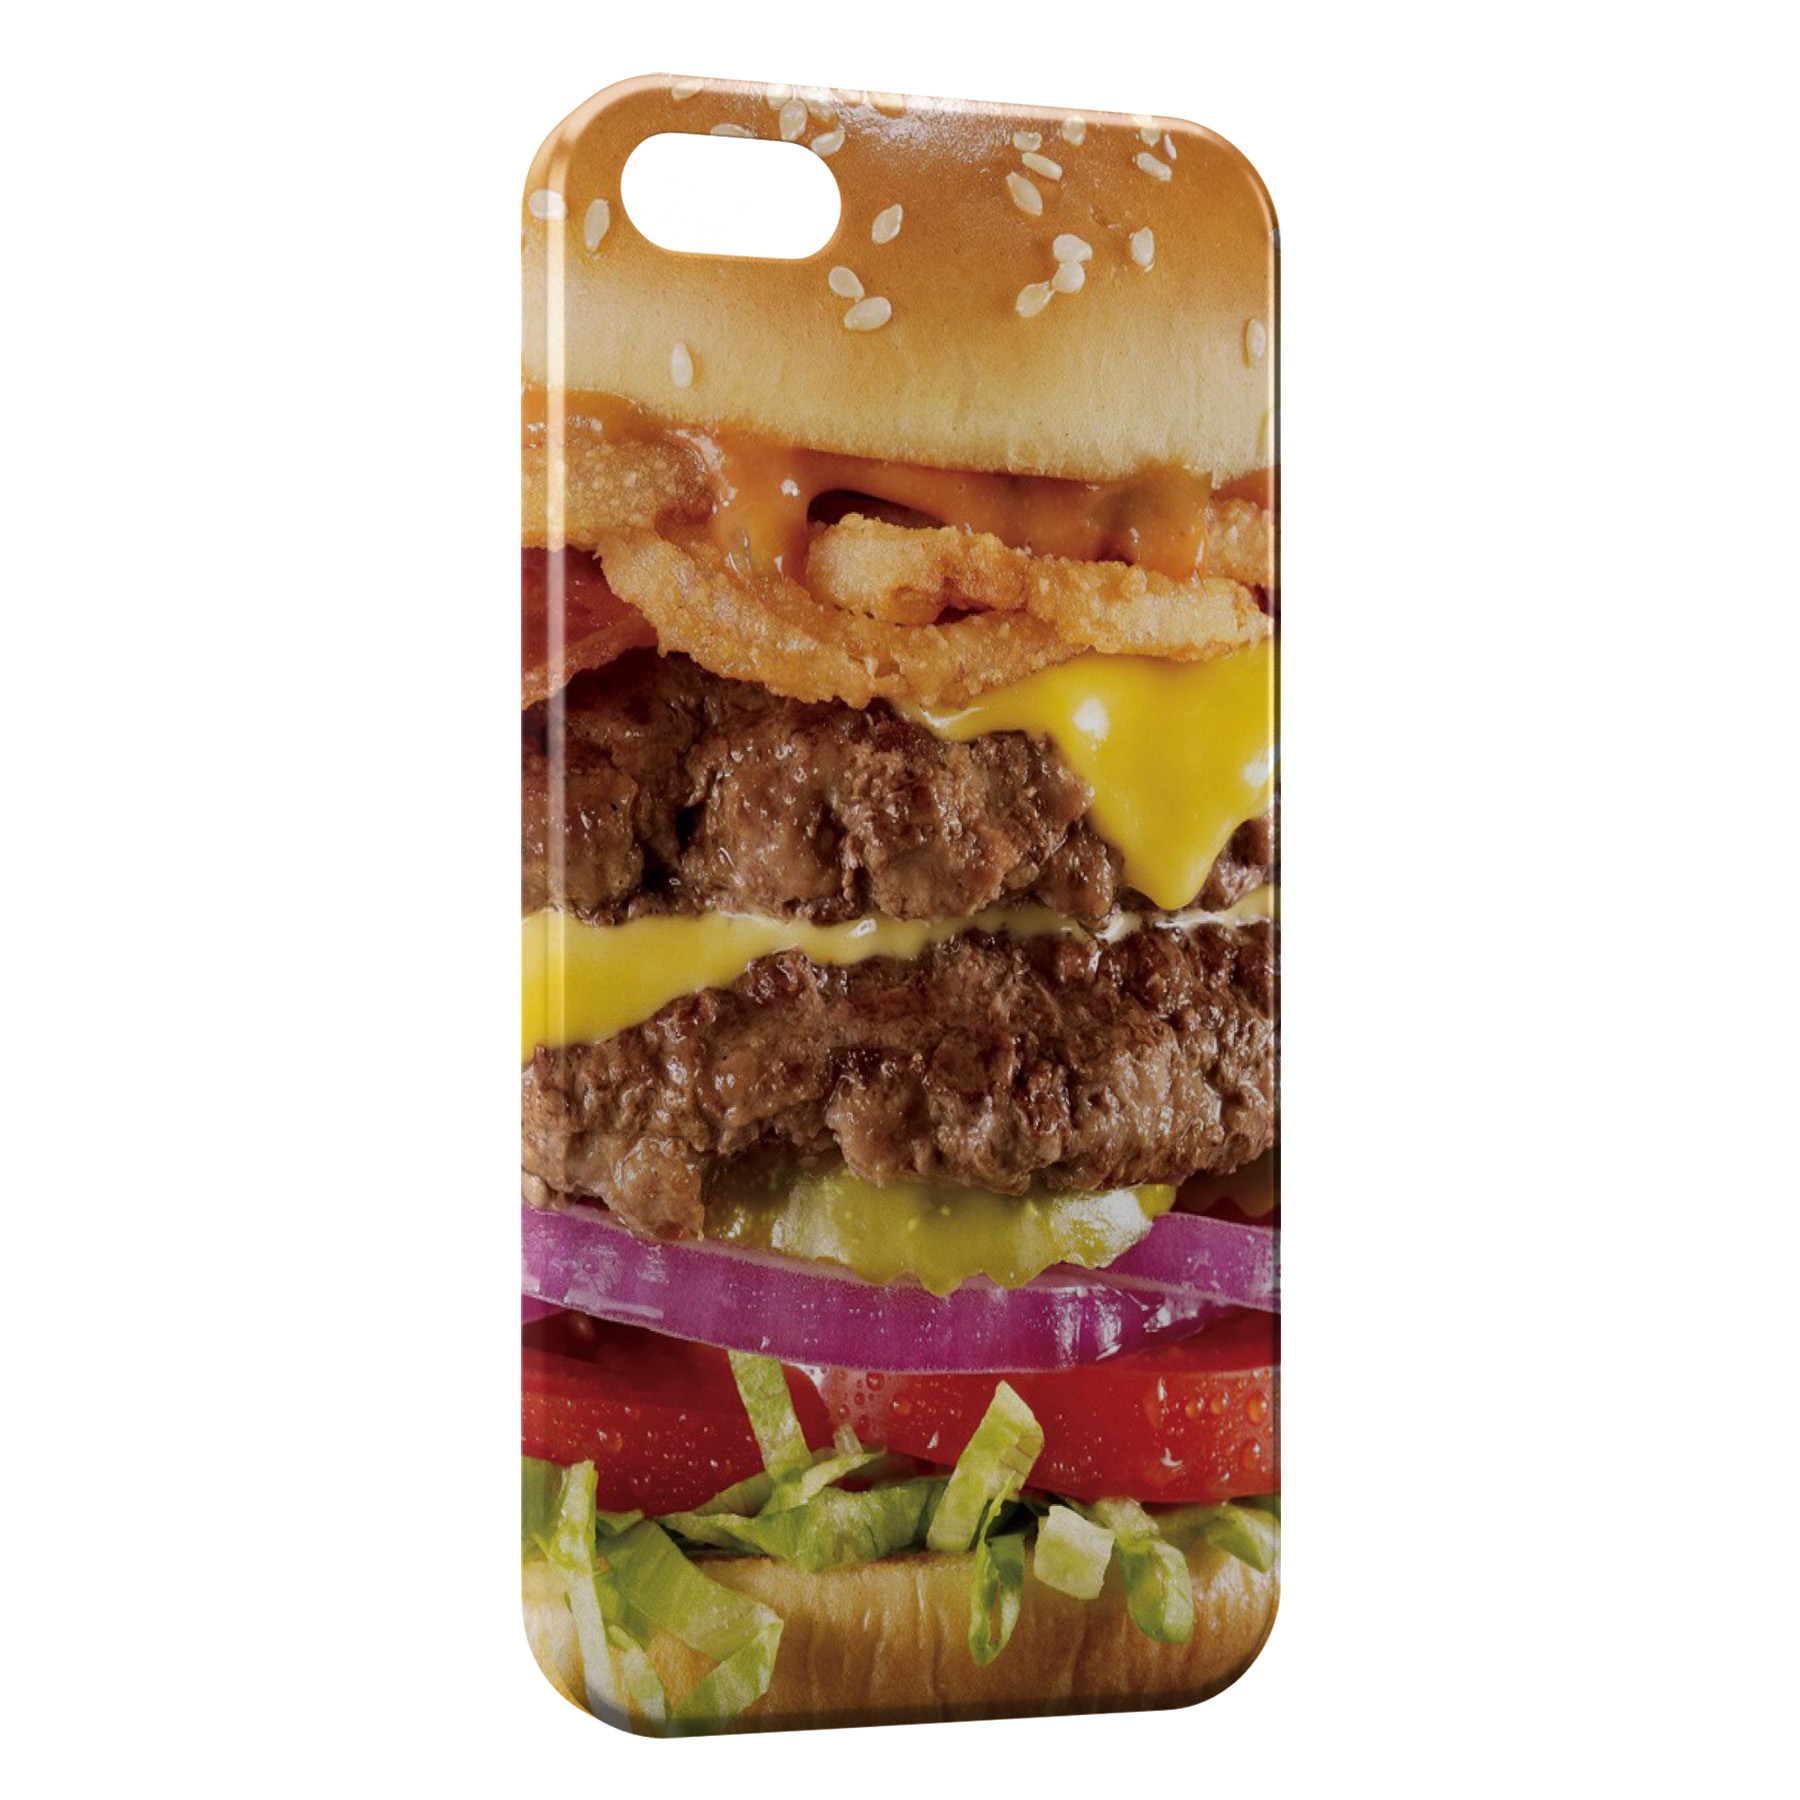 coque iphone 8 plus hamberger